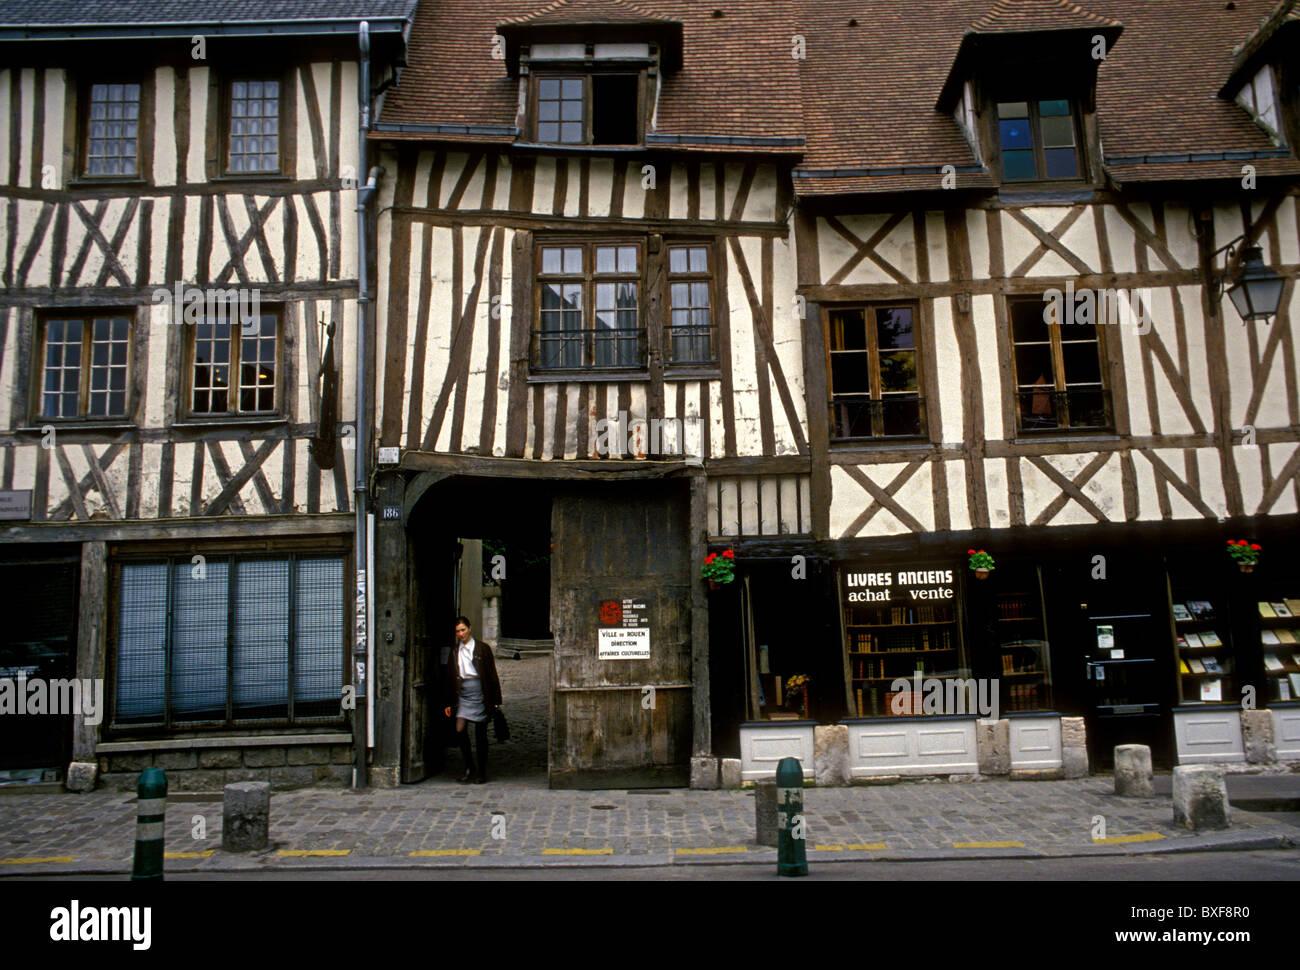 bookstore, bookshop, bookseller, book dealer, Rue de Martainville, city of Rouen, Upper Normandy, France - Stock Image